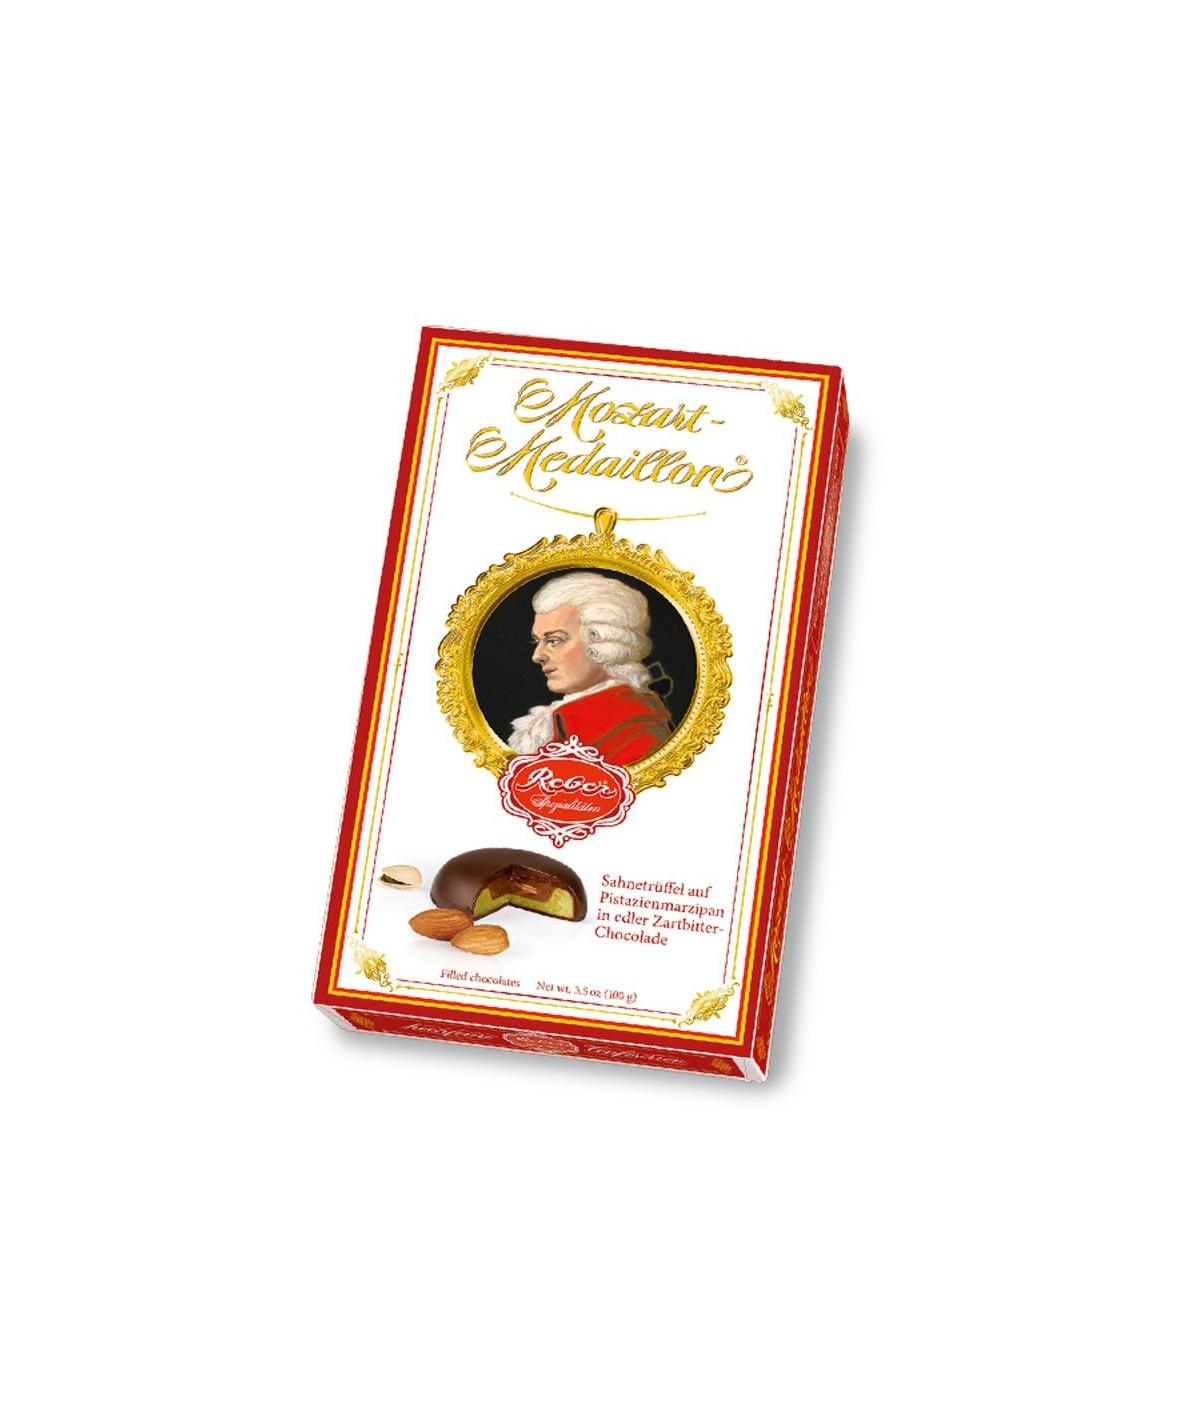 Mozart Medaillon Reber 100g